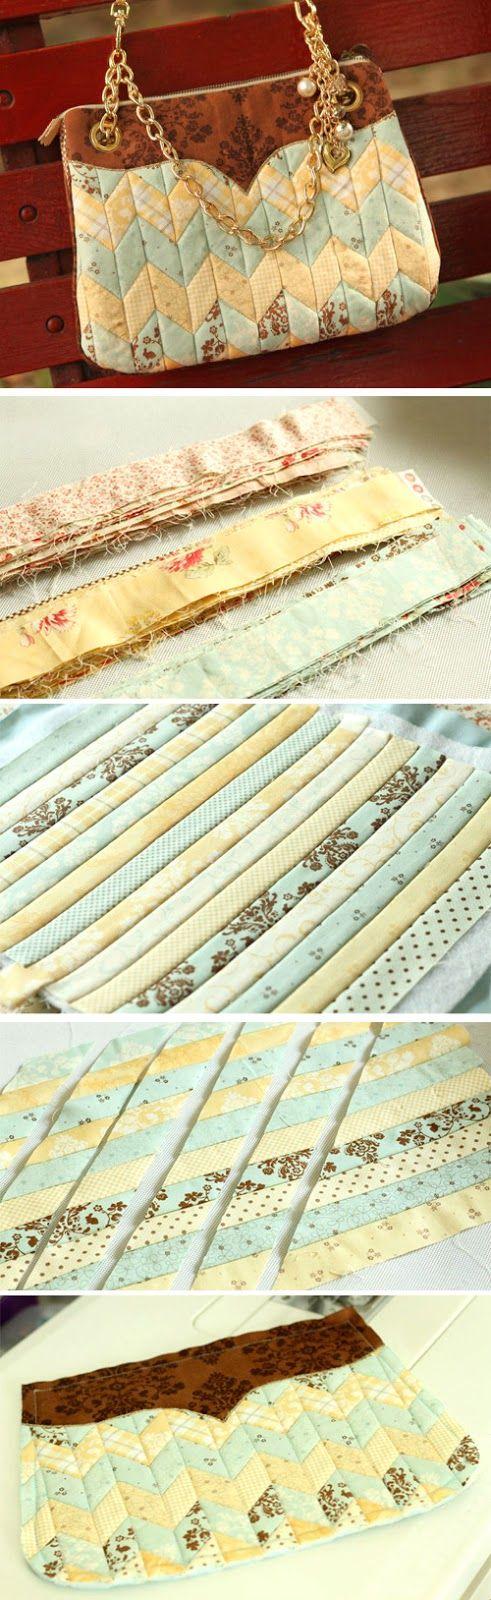 Patchwork Bag. Photo Sewing Step by step Process.  http://www.handmadiya.com/2016/02/bag-of-fabric-strips.html